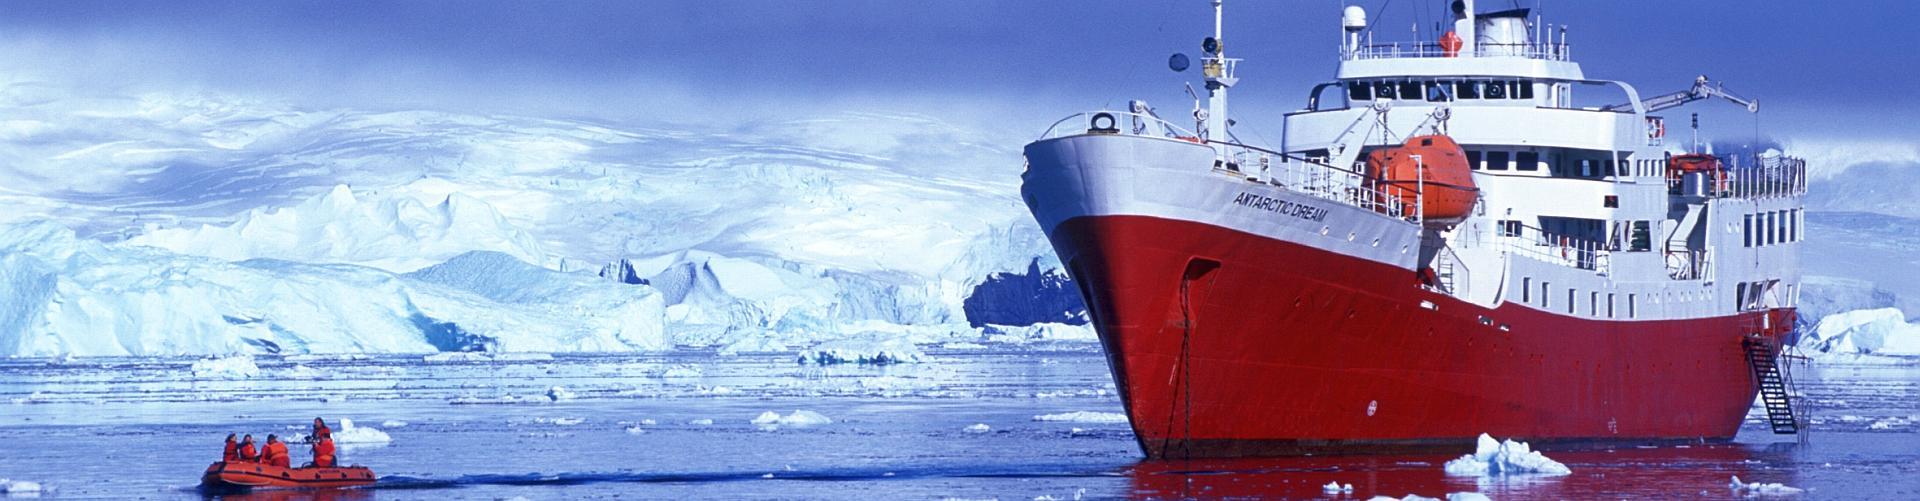 Antarktis Expedition mit Ikarus Tours